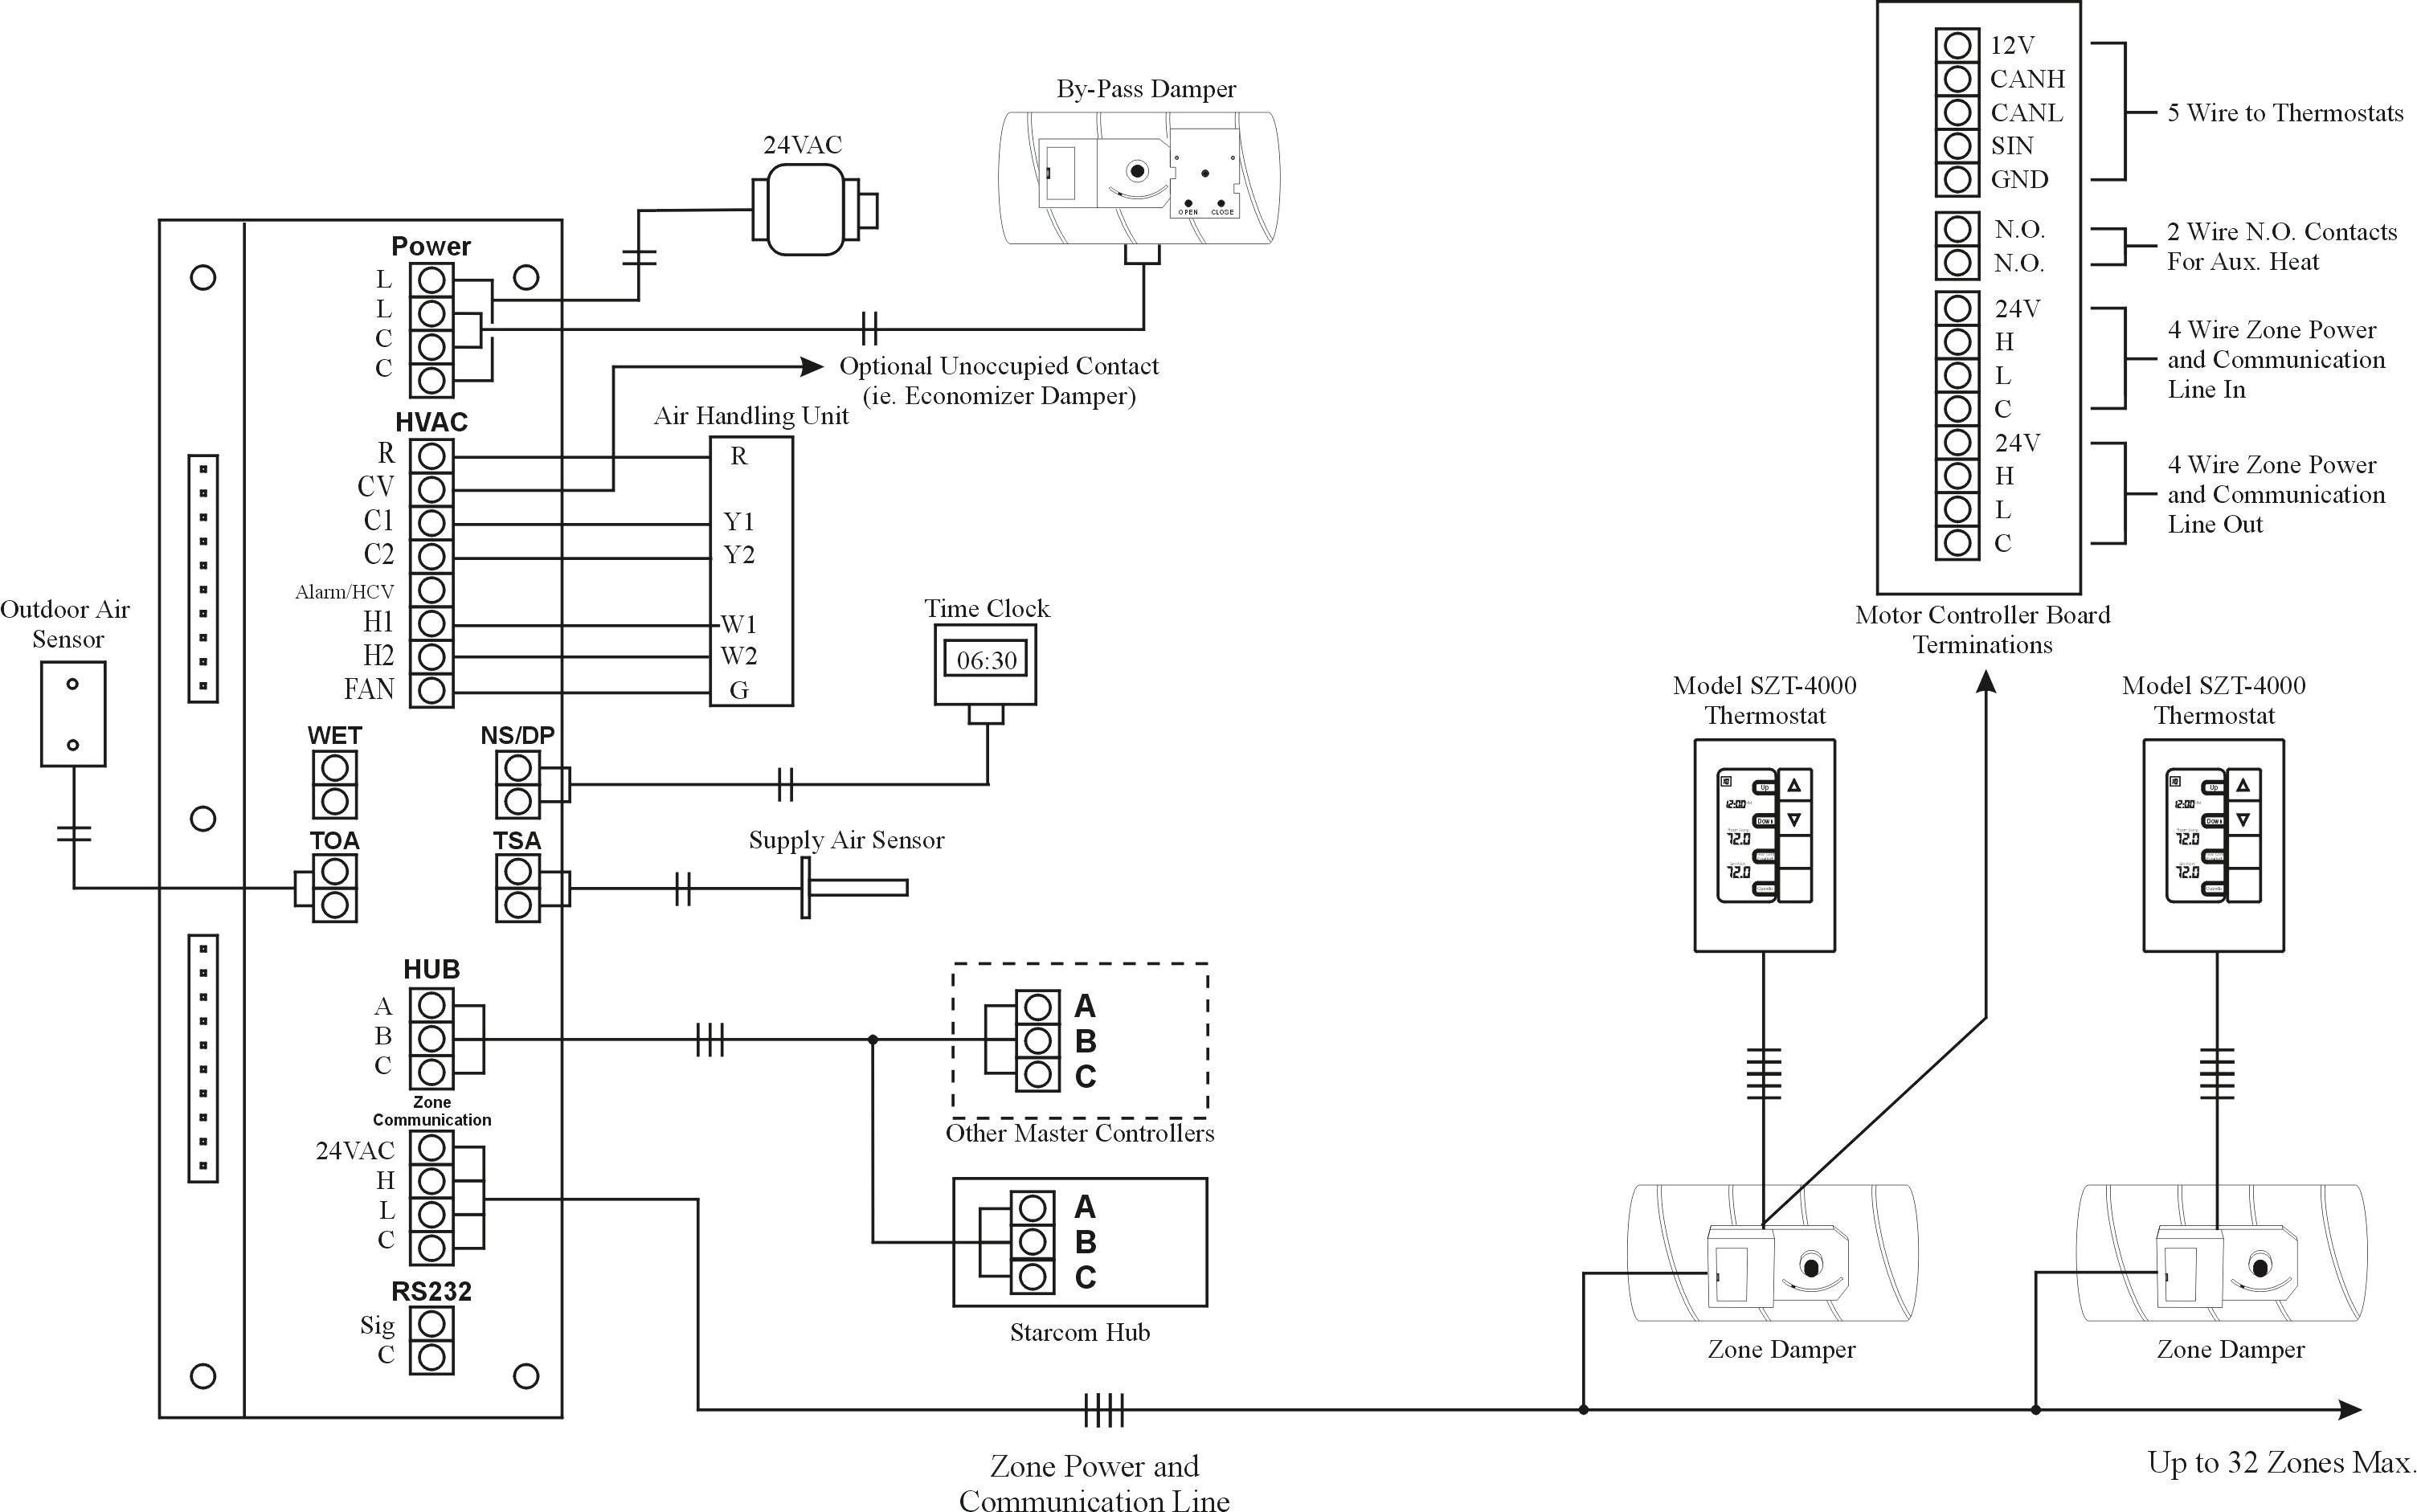 Car Heater Blower Motor Wiring Diagram Goodman Furnace Wiring Diagram Heater Electric Marvelous Plete Of Car Heater Blower Motor Wiring Diagram